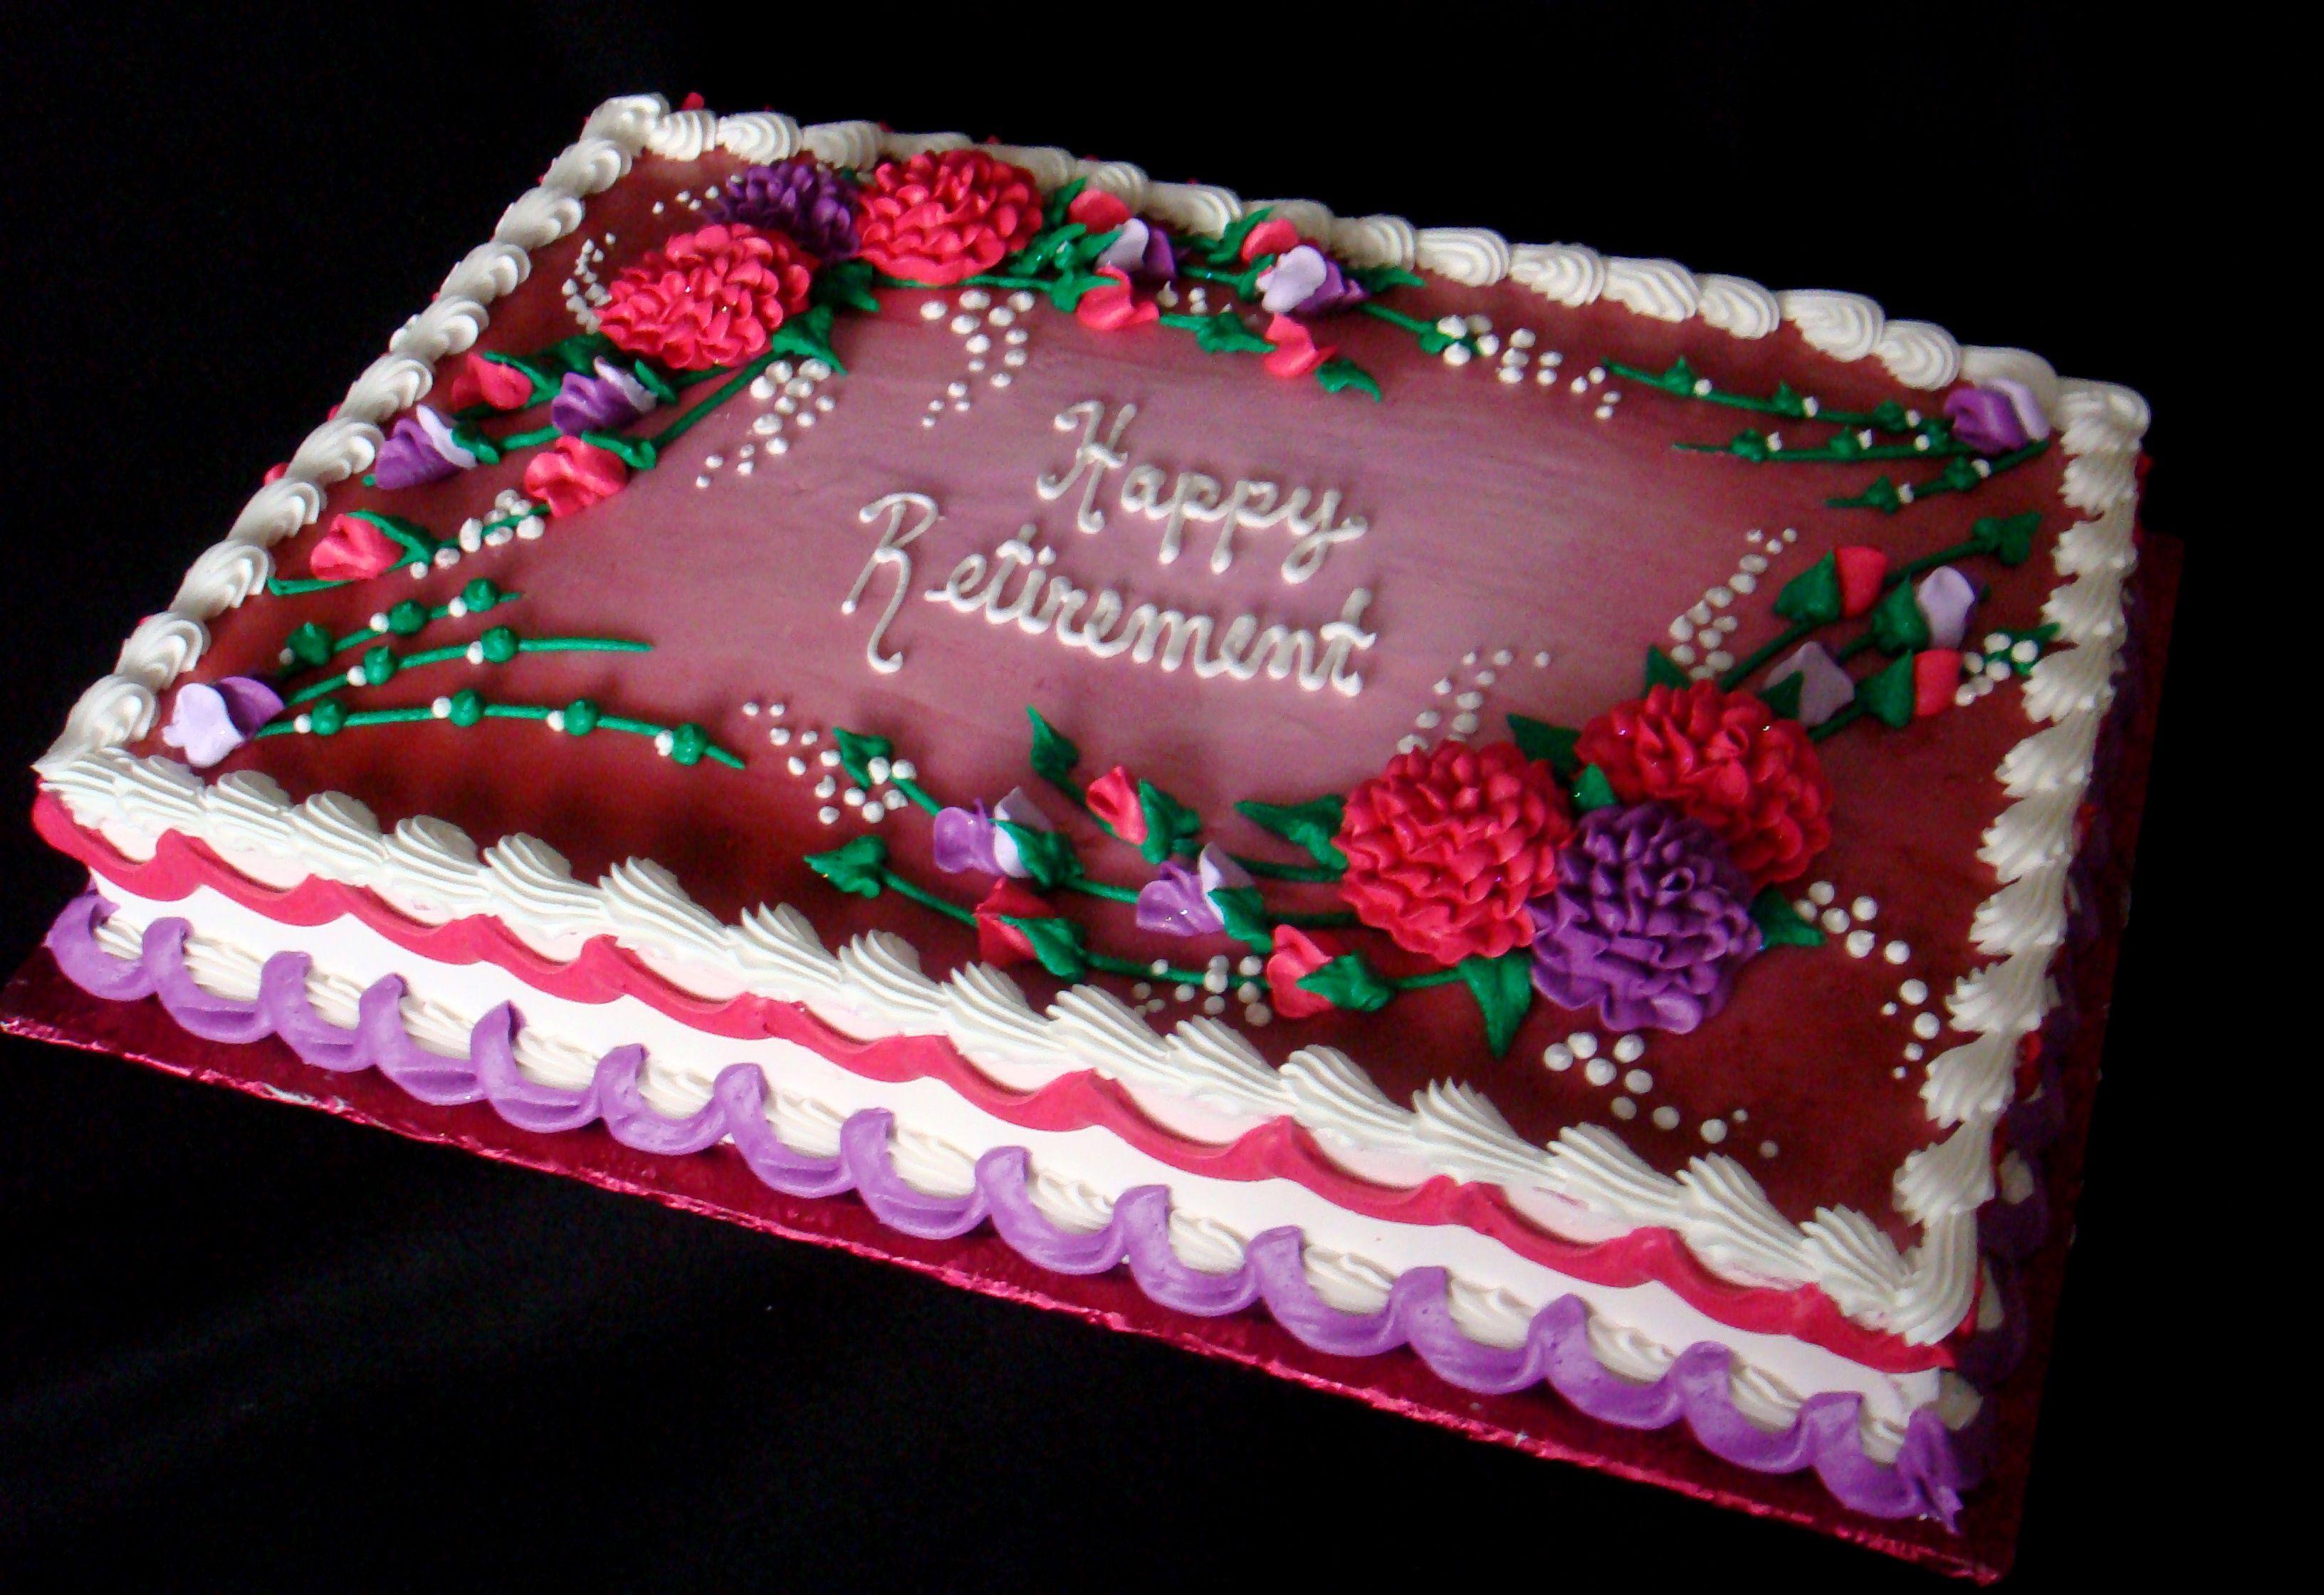 Happy retirement retirement retirement cakes cake